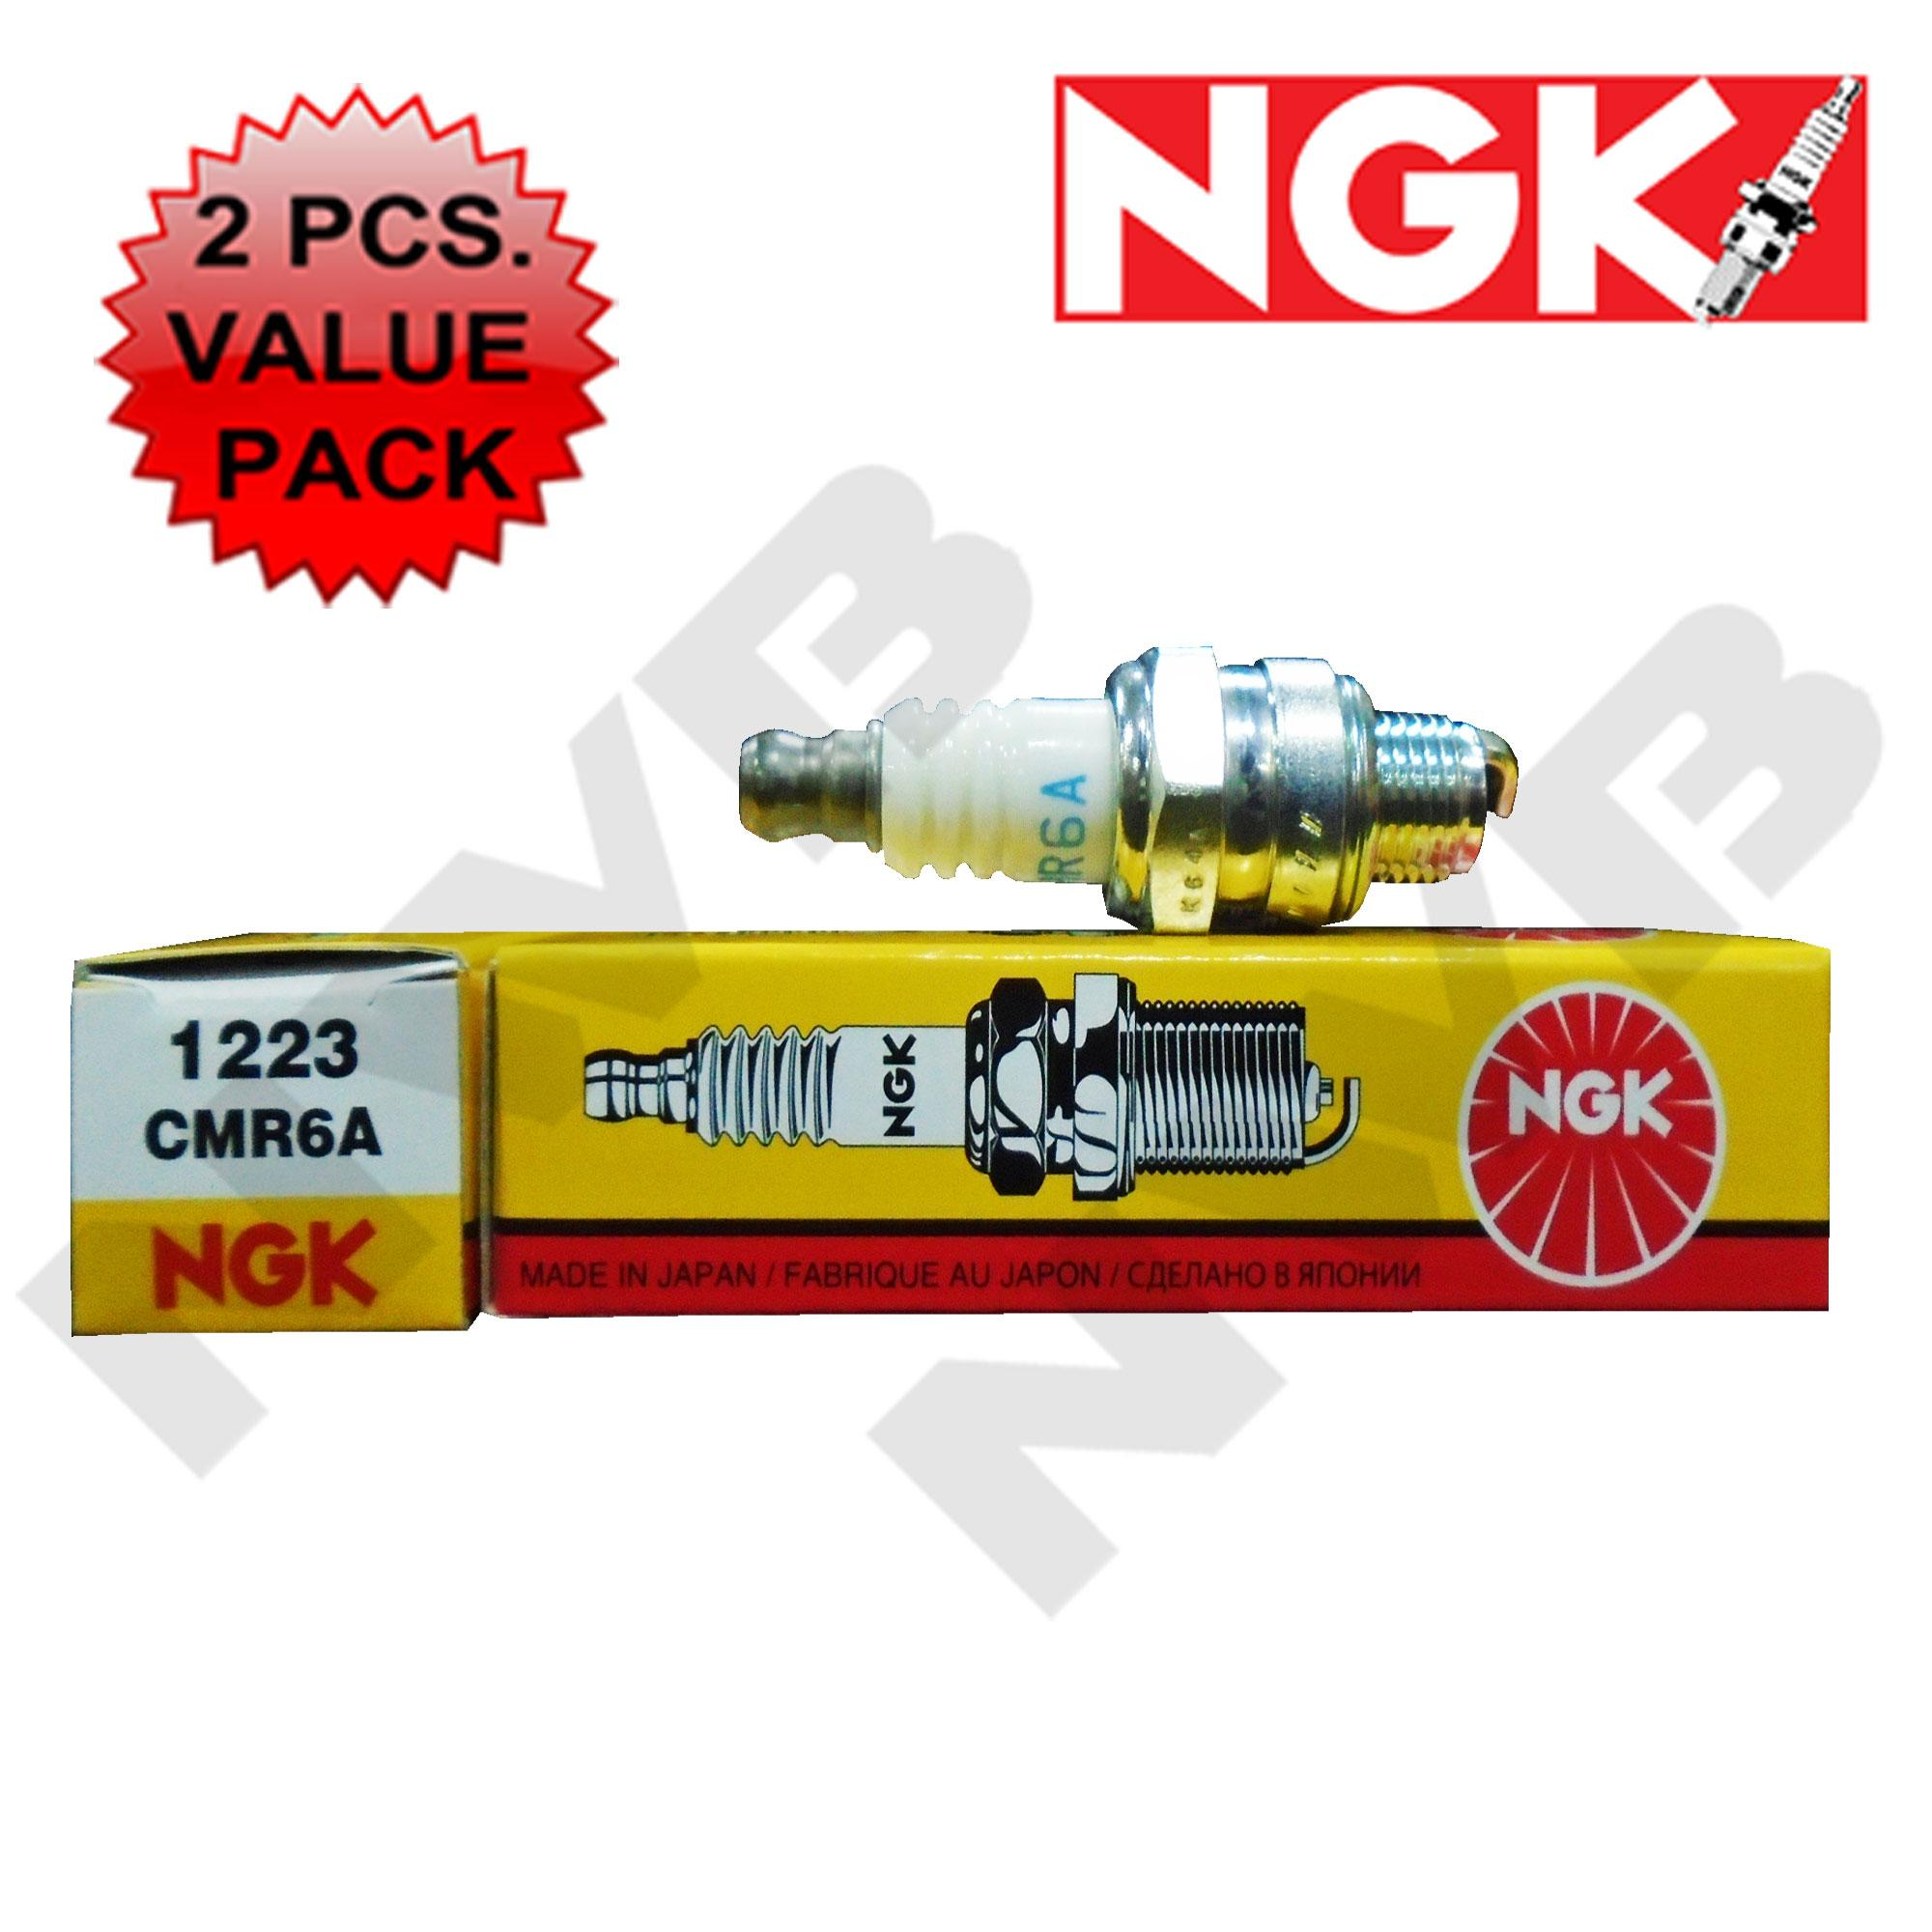 Ngk Cmr6a Spark Plug 2pcs. Value Pack By Nwb Wiper Blade.